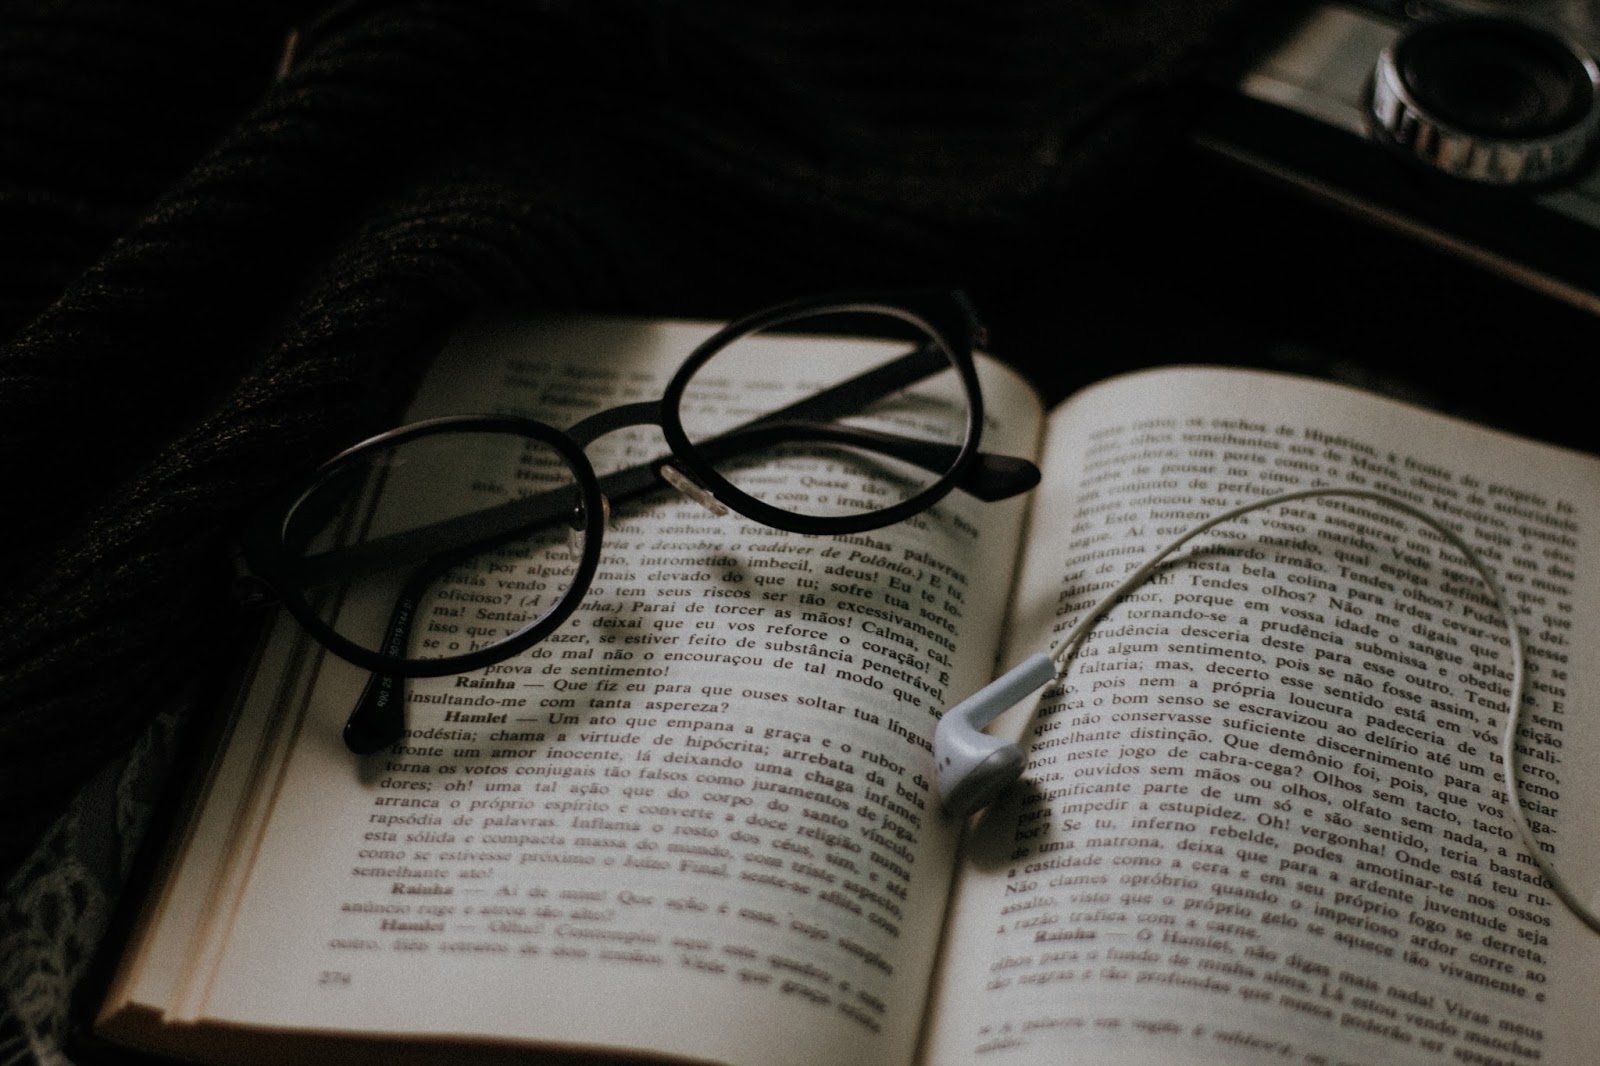 playlist-abril-de-2017-playlist-depressiva-playlist-indie-oculos-livro-fones-de-ouvido-blog-mad-souls